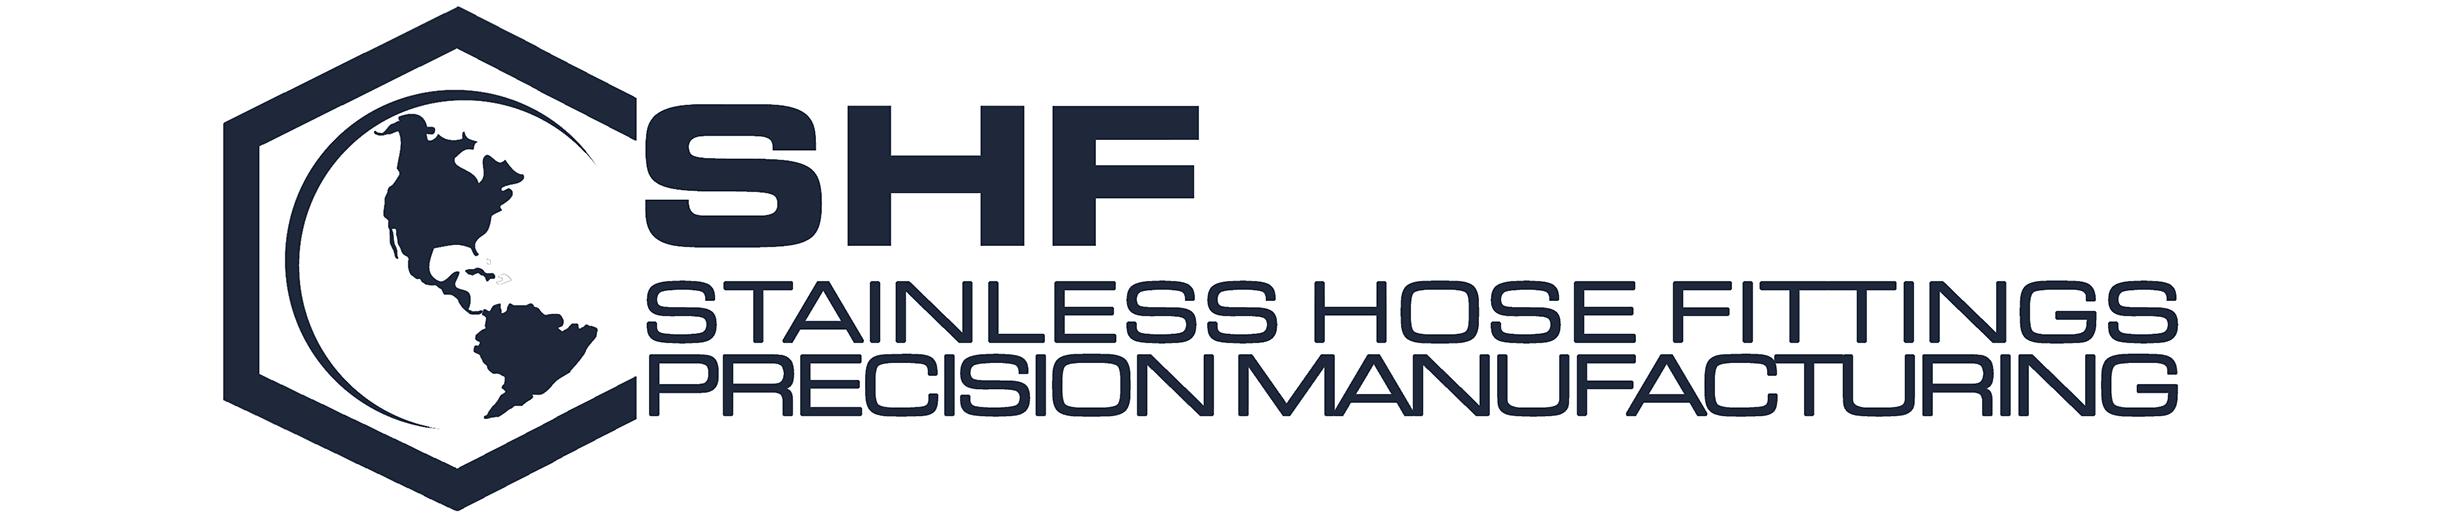 Stainless Hose Fittings Ltd